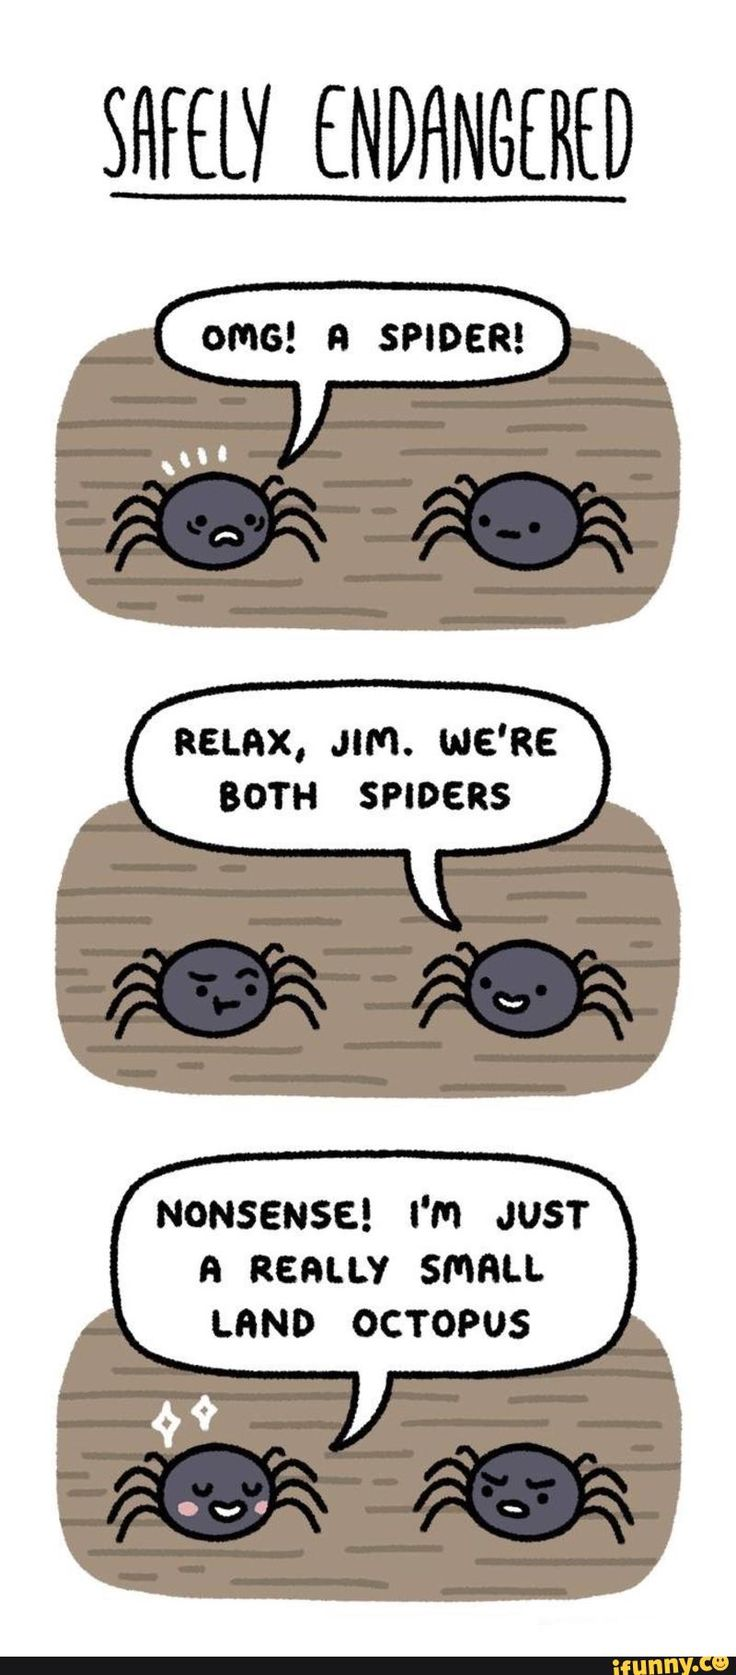 comic, lol, land, octopus, spiders